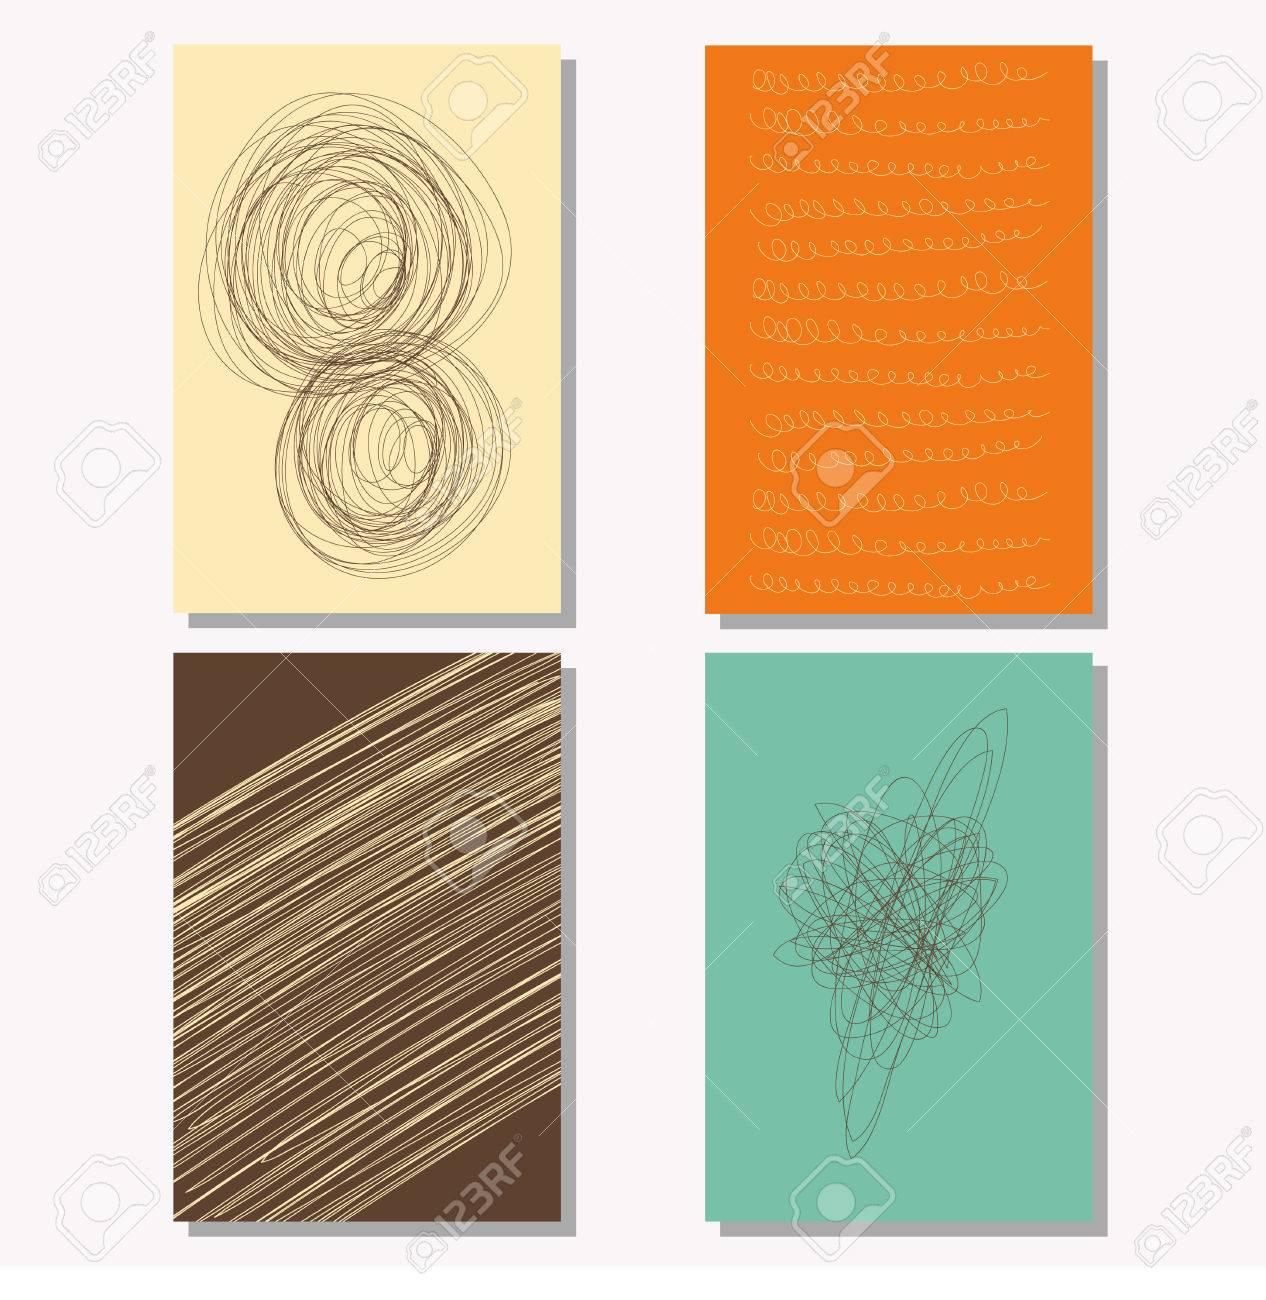 Exercise book design graphic